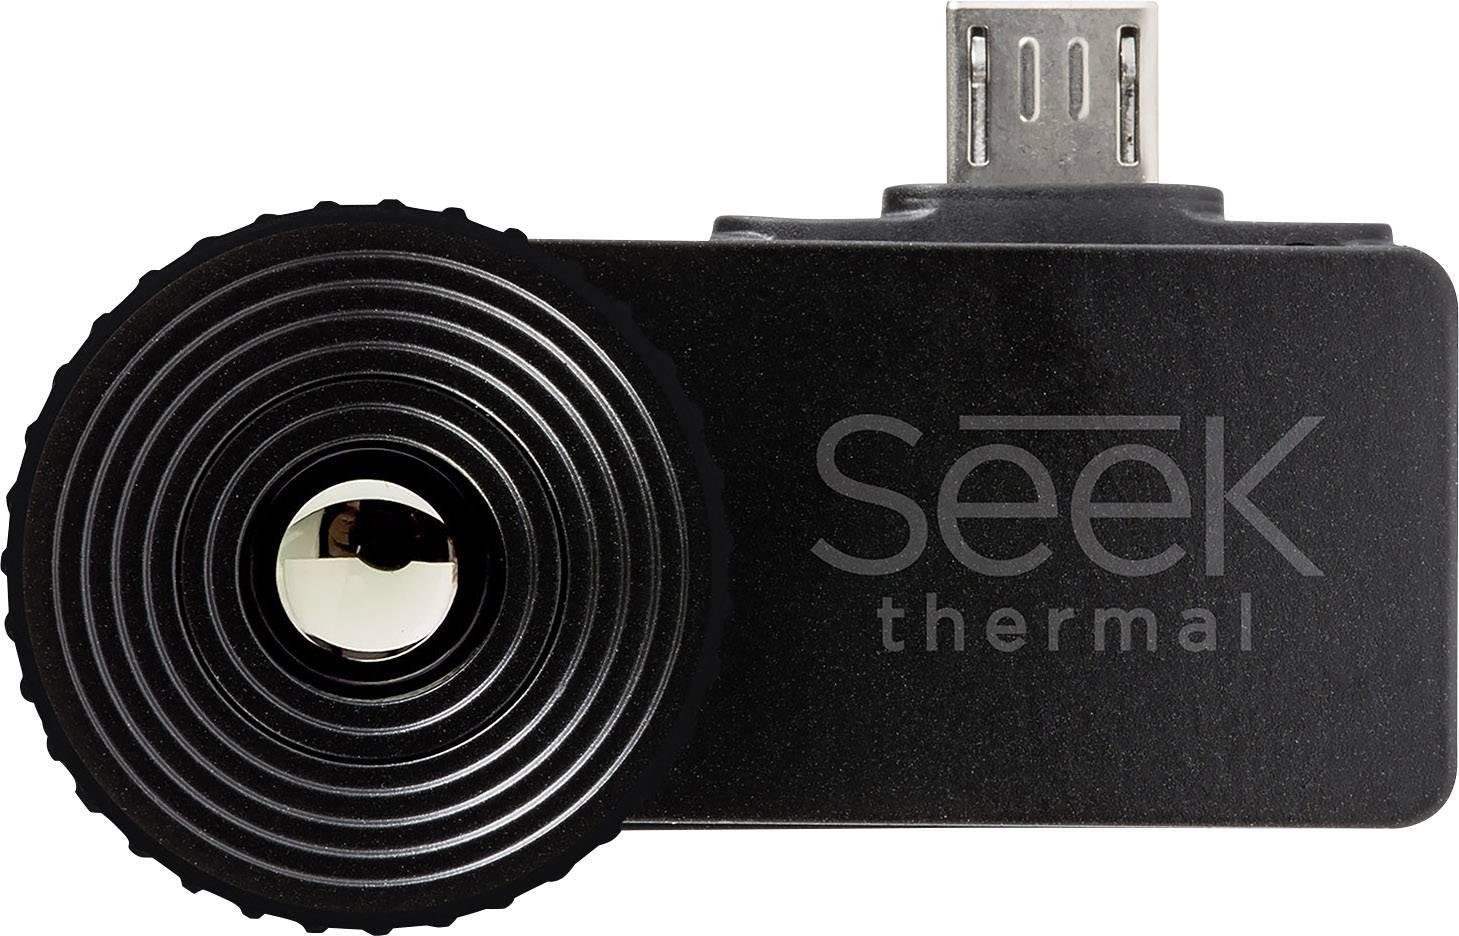 Termálna kamera Seek Thermal Compact XR SK1002AN pre Android, 206 x 156 pix